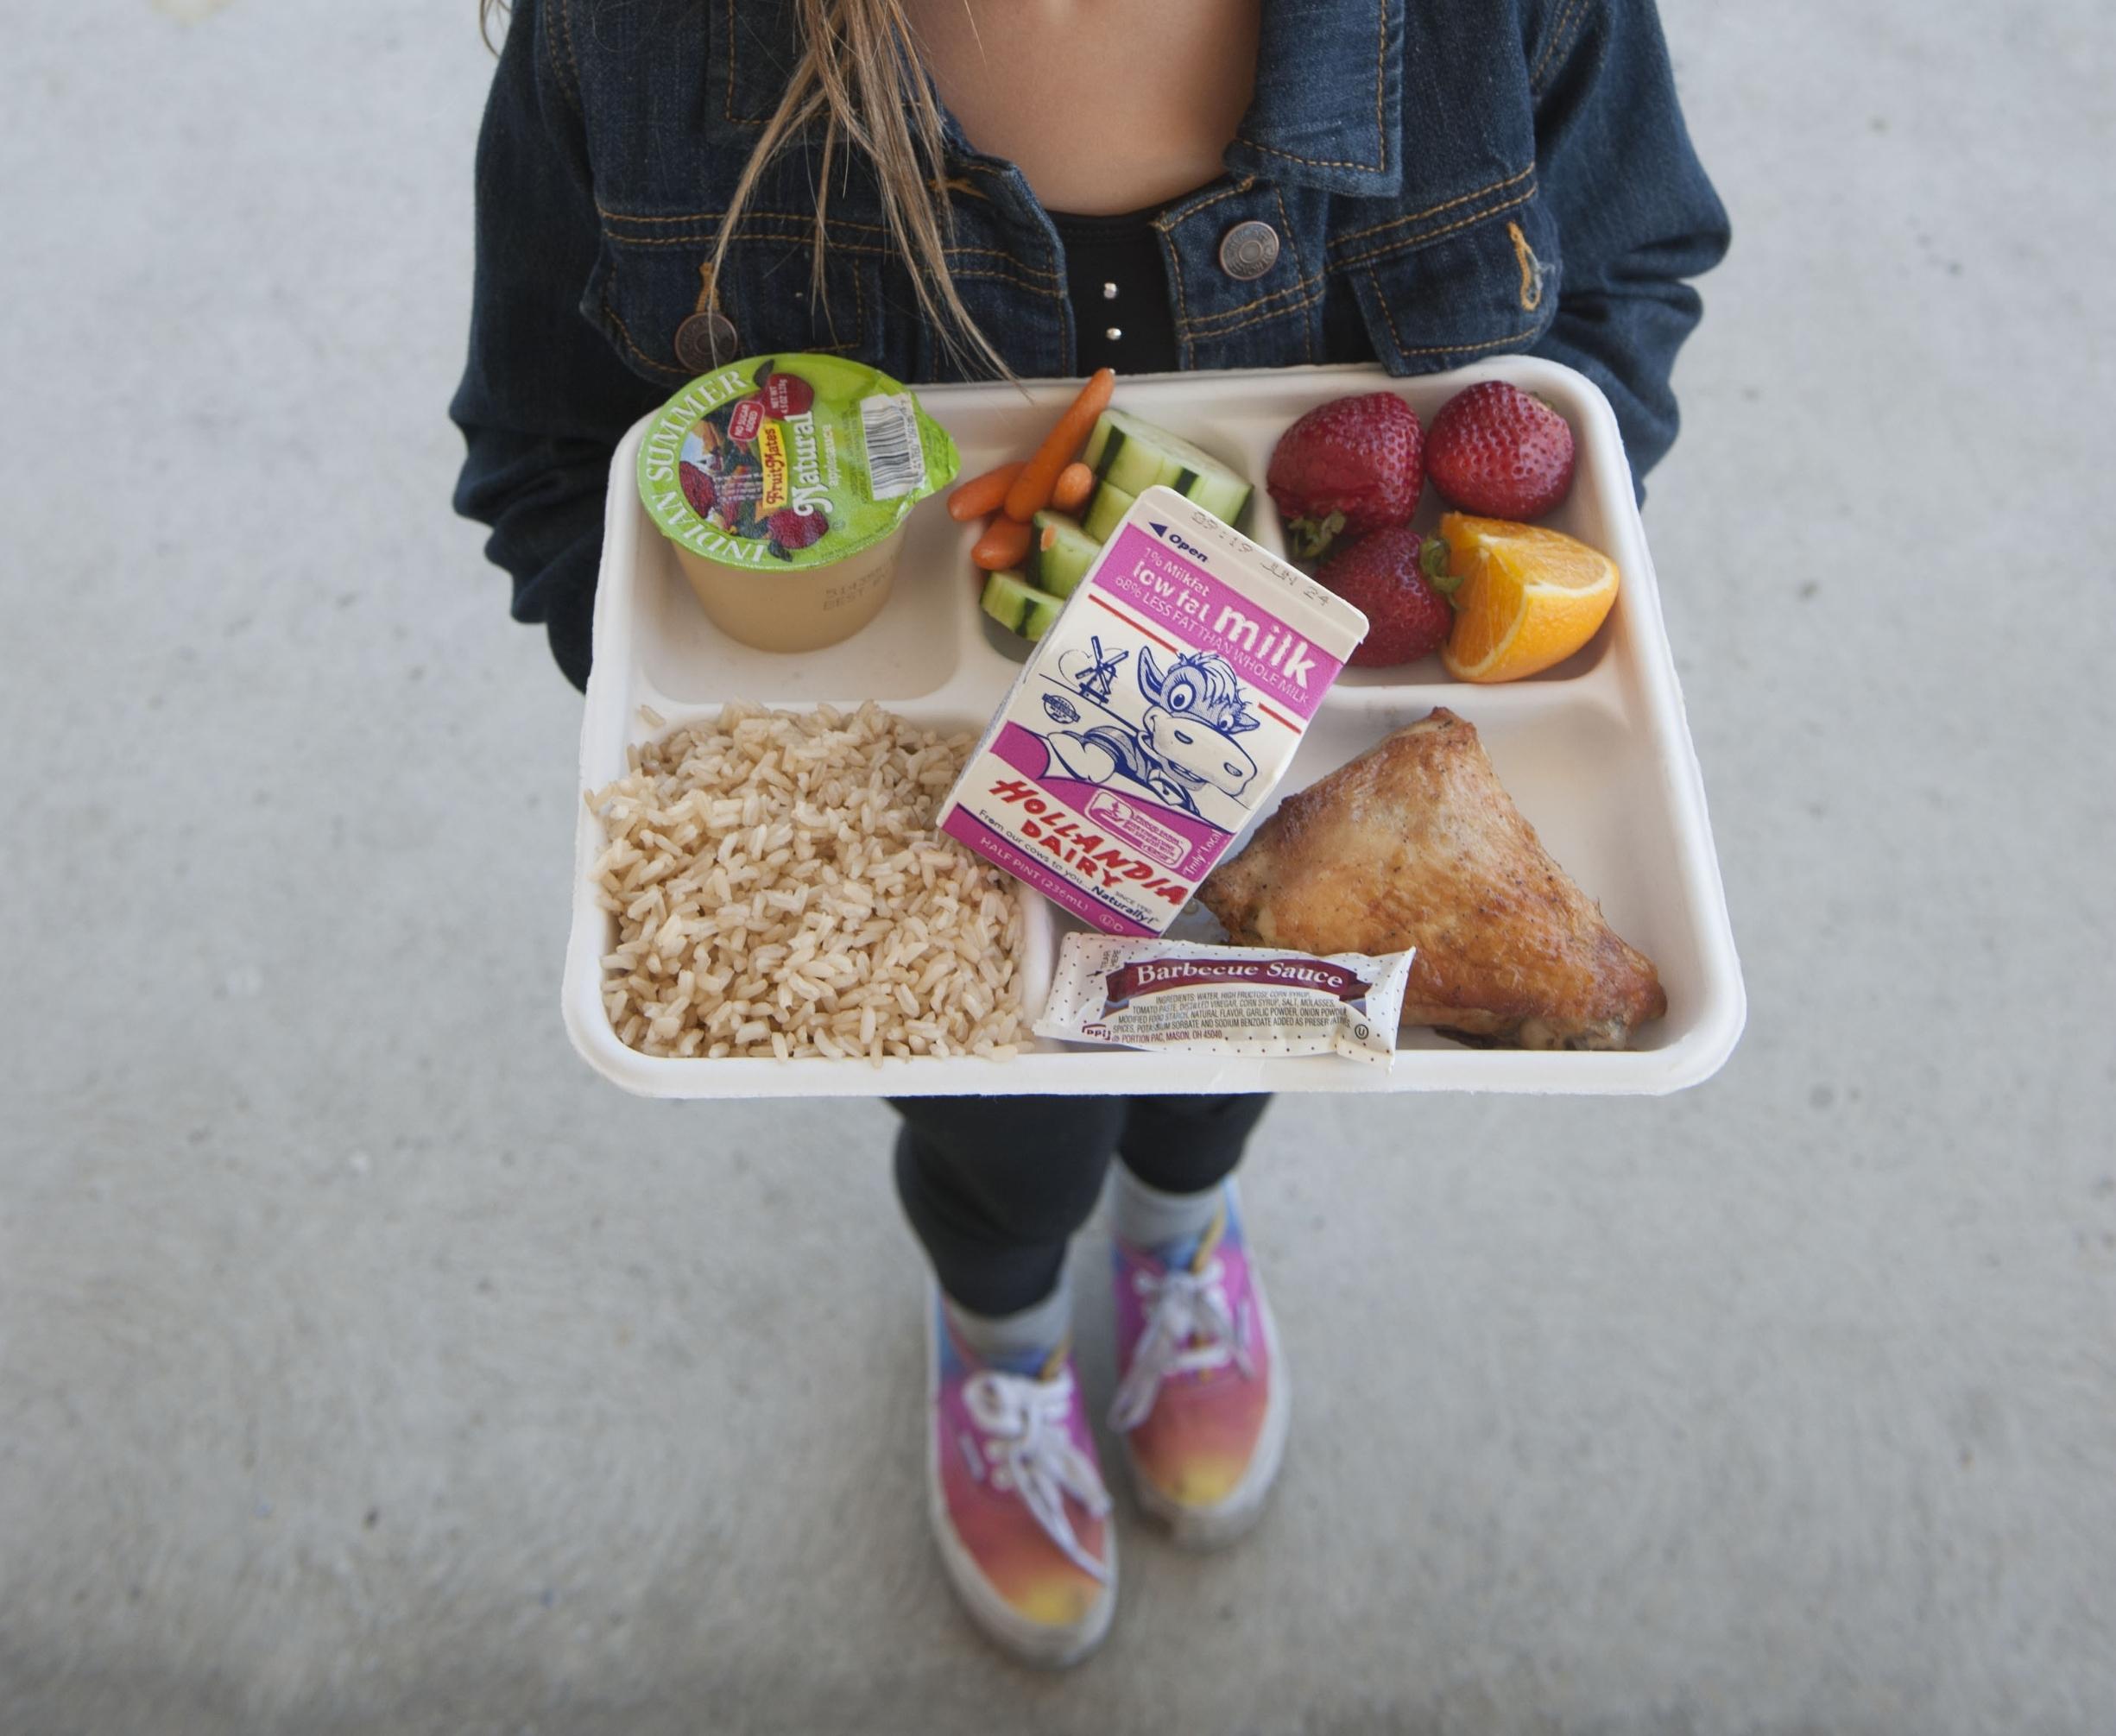 Newsweek:         Eat Less, Live Longer?